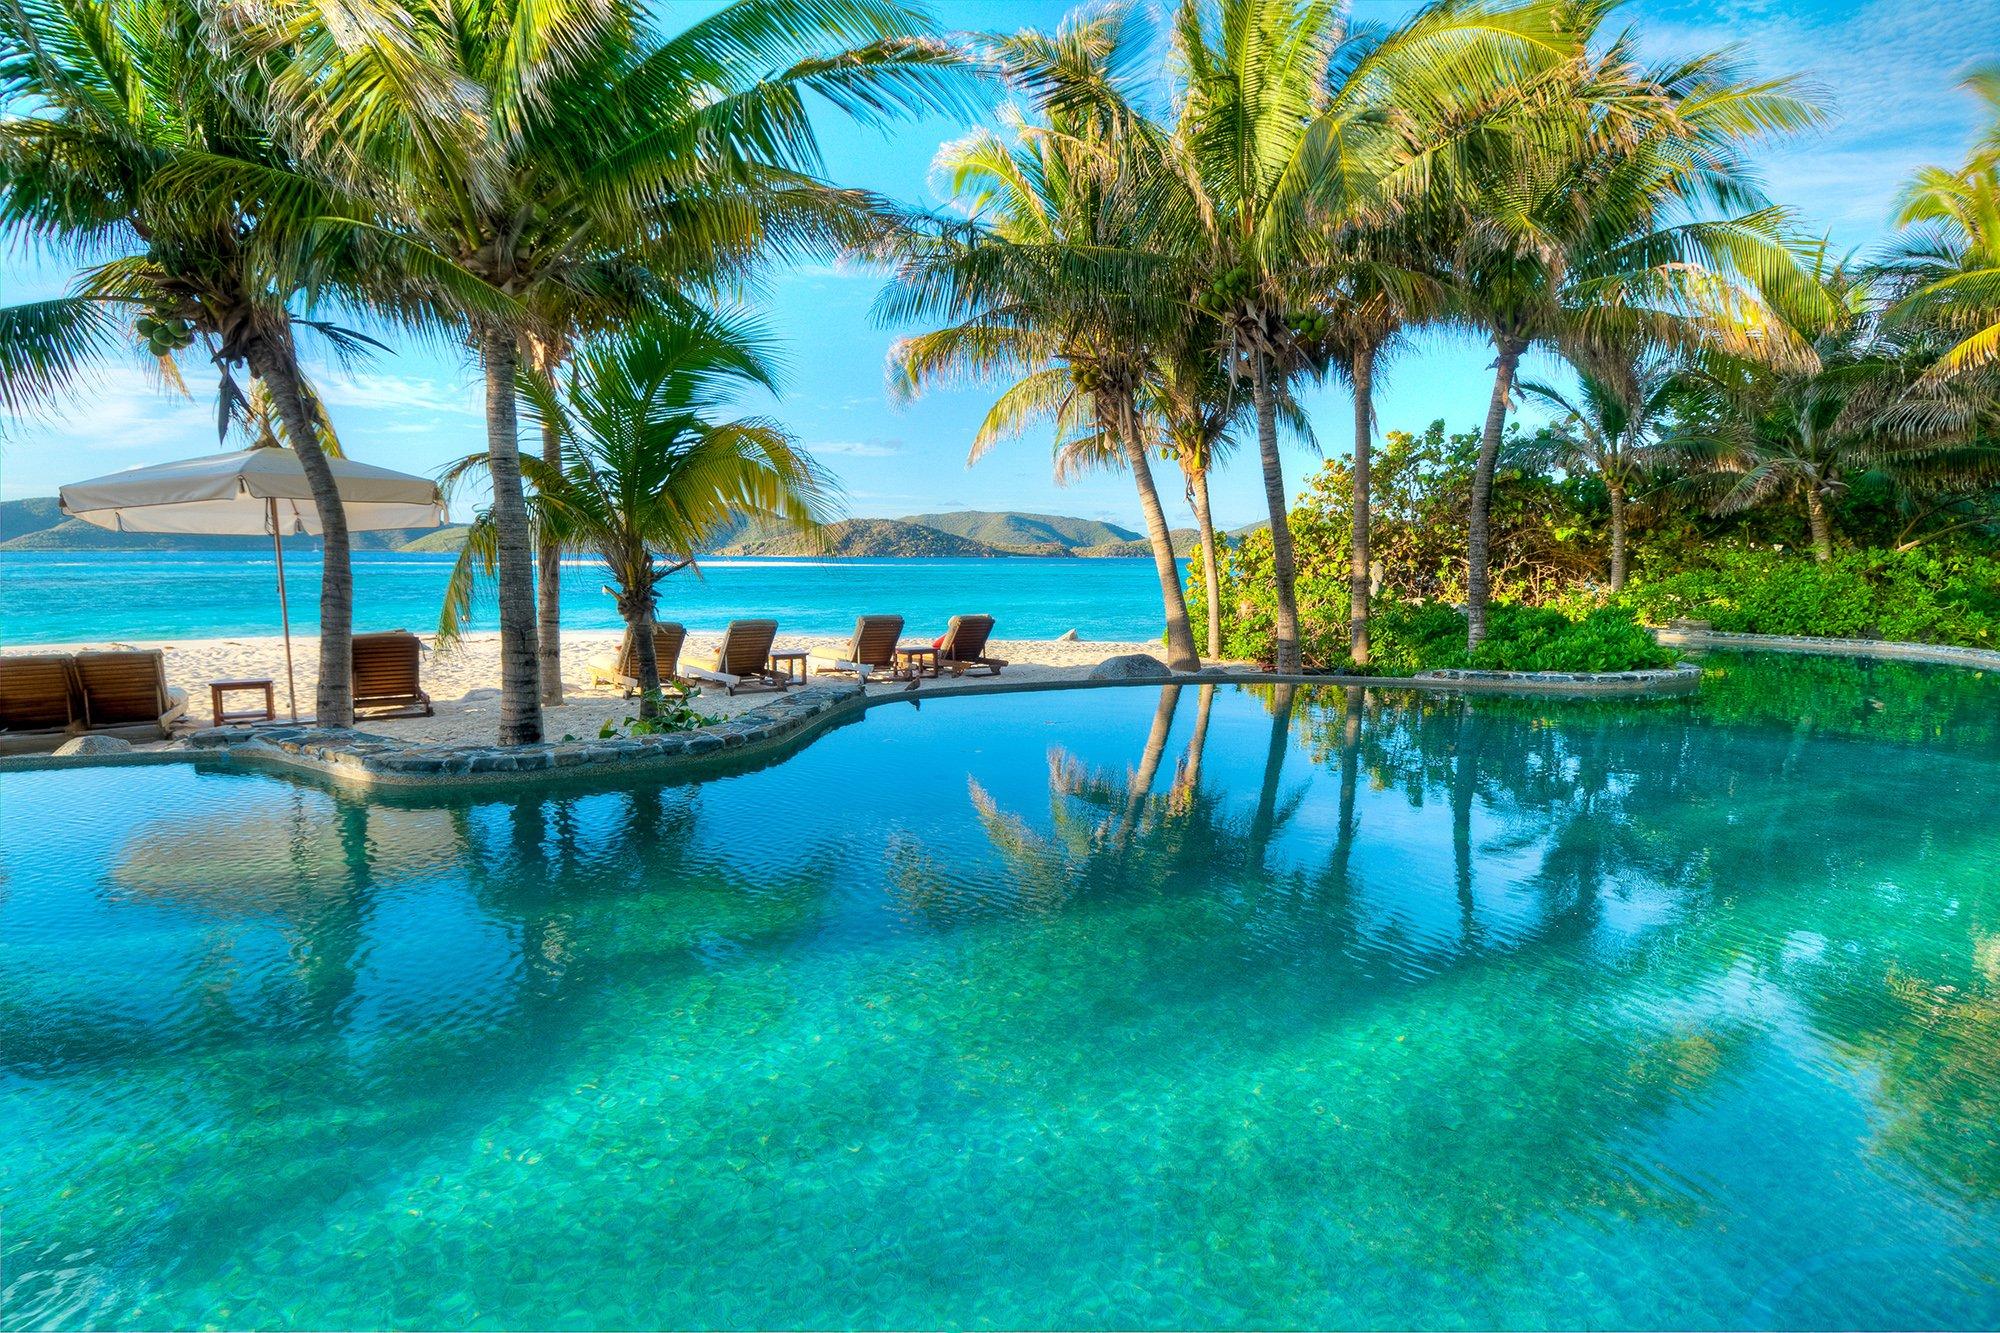 Necker-island-beach-pool-infinity